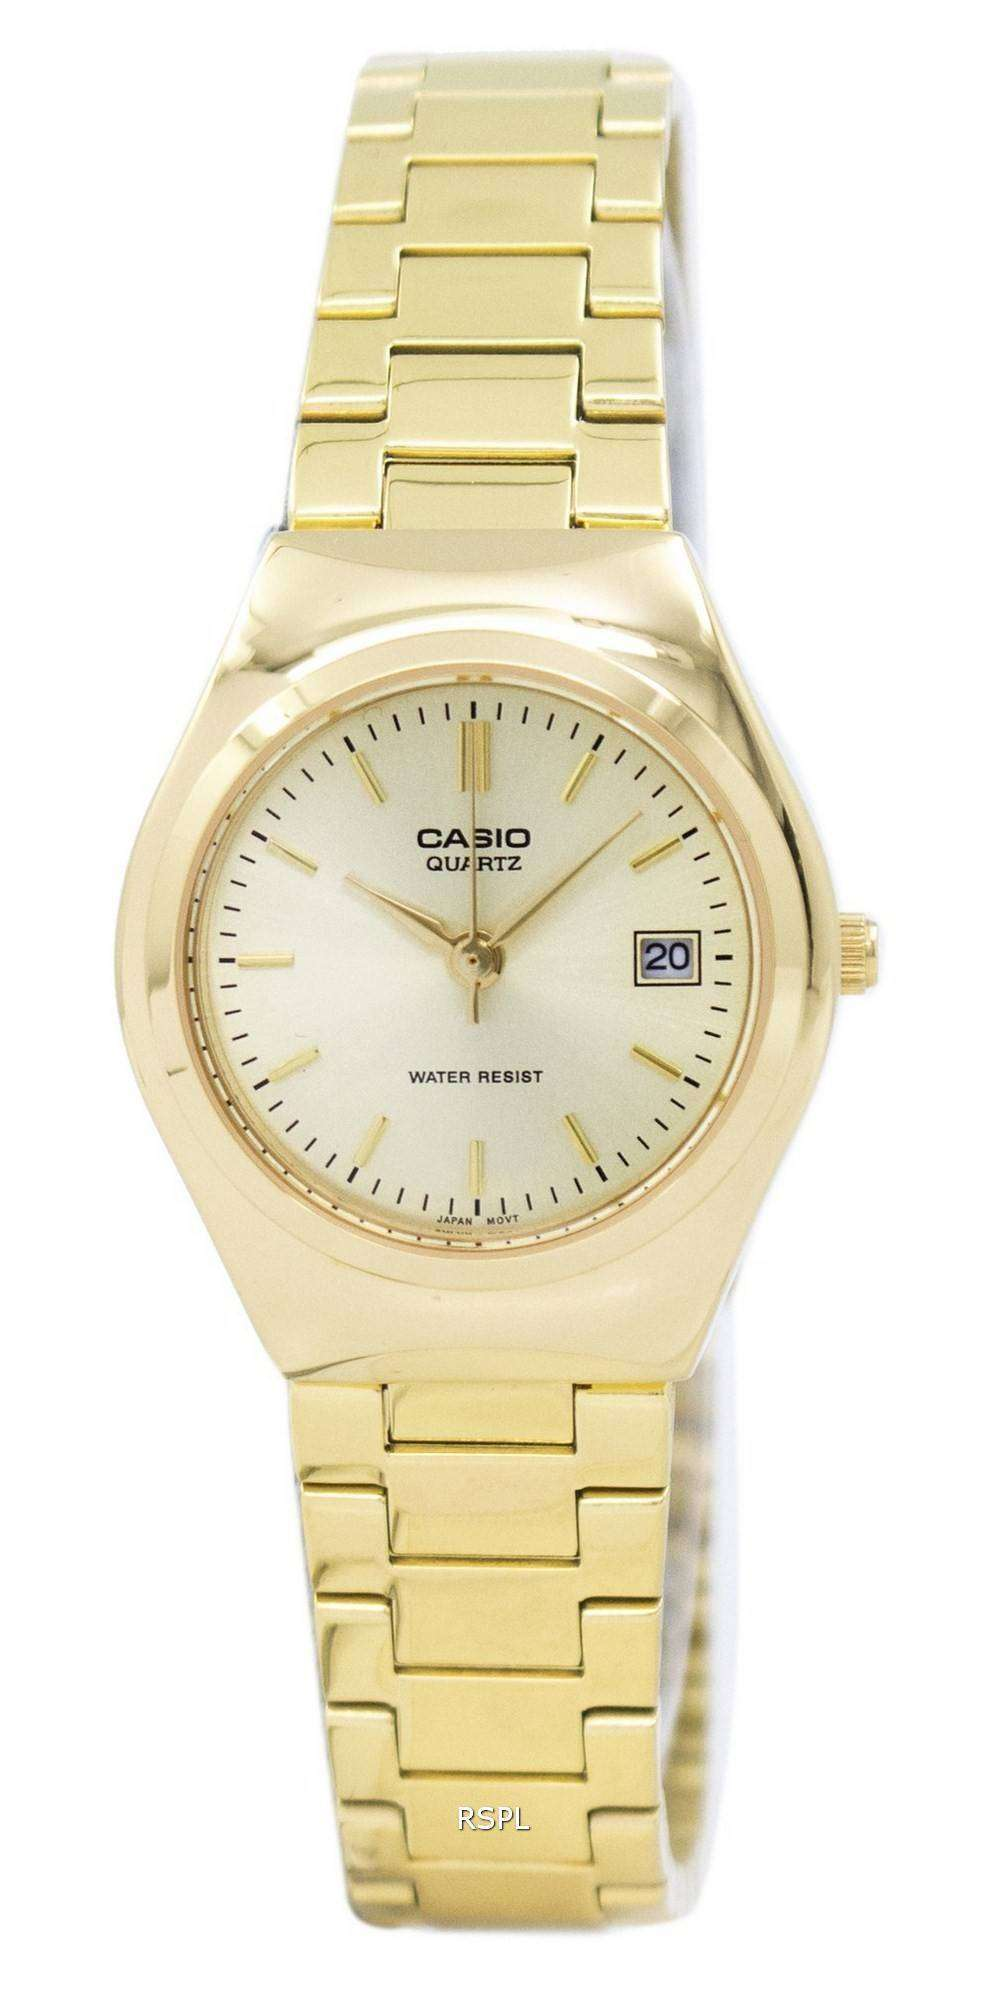 b2c591bad69e Casio analógico dorado LTP-1170N-9ARDF LTP-1170N-9AR reloj de mujeres